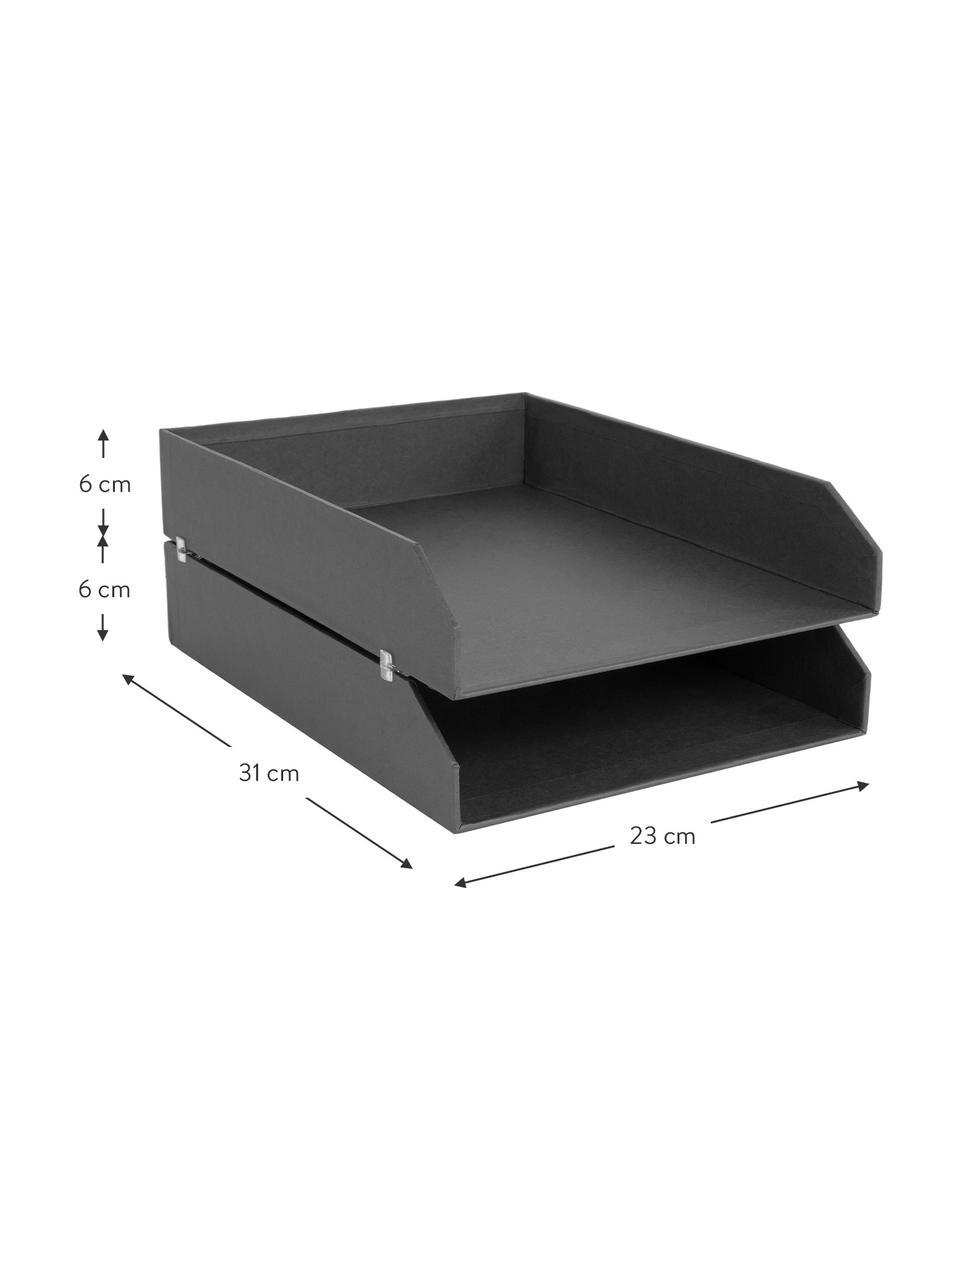 Dokumenten-Ablagen Hakan, 2 Stück, Fester, laminierter Karton, Schwarz, B 23 x T 31 cm